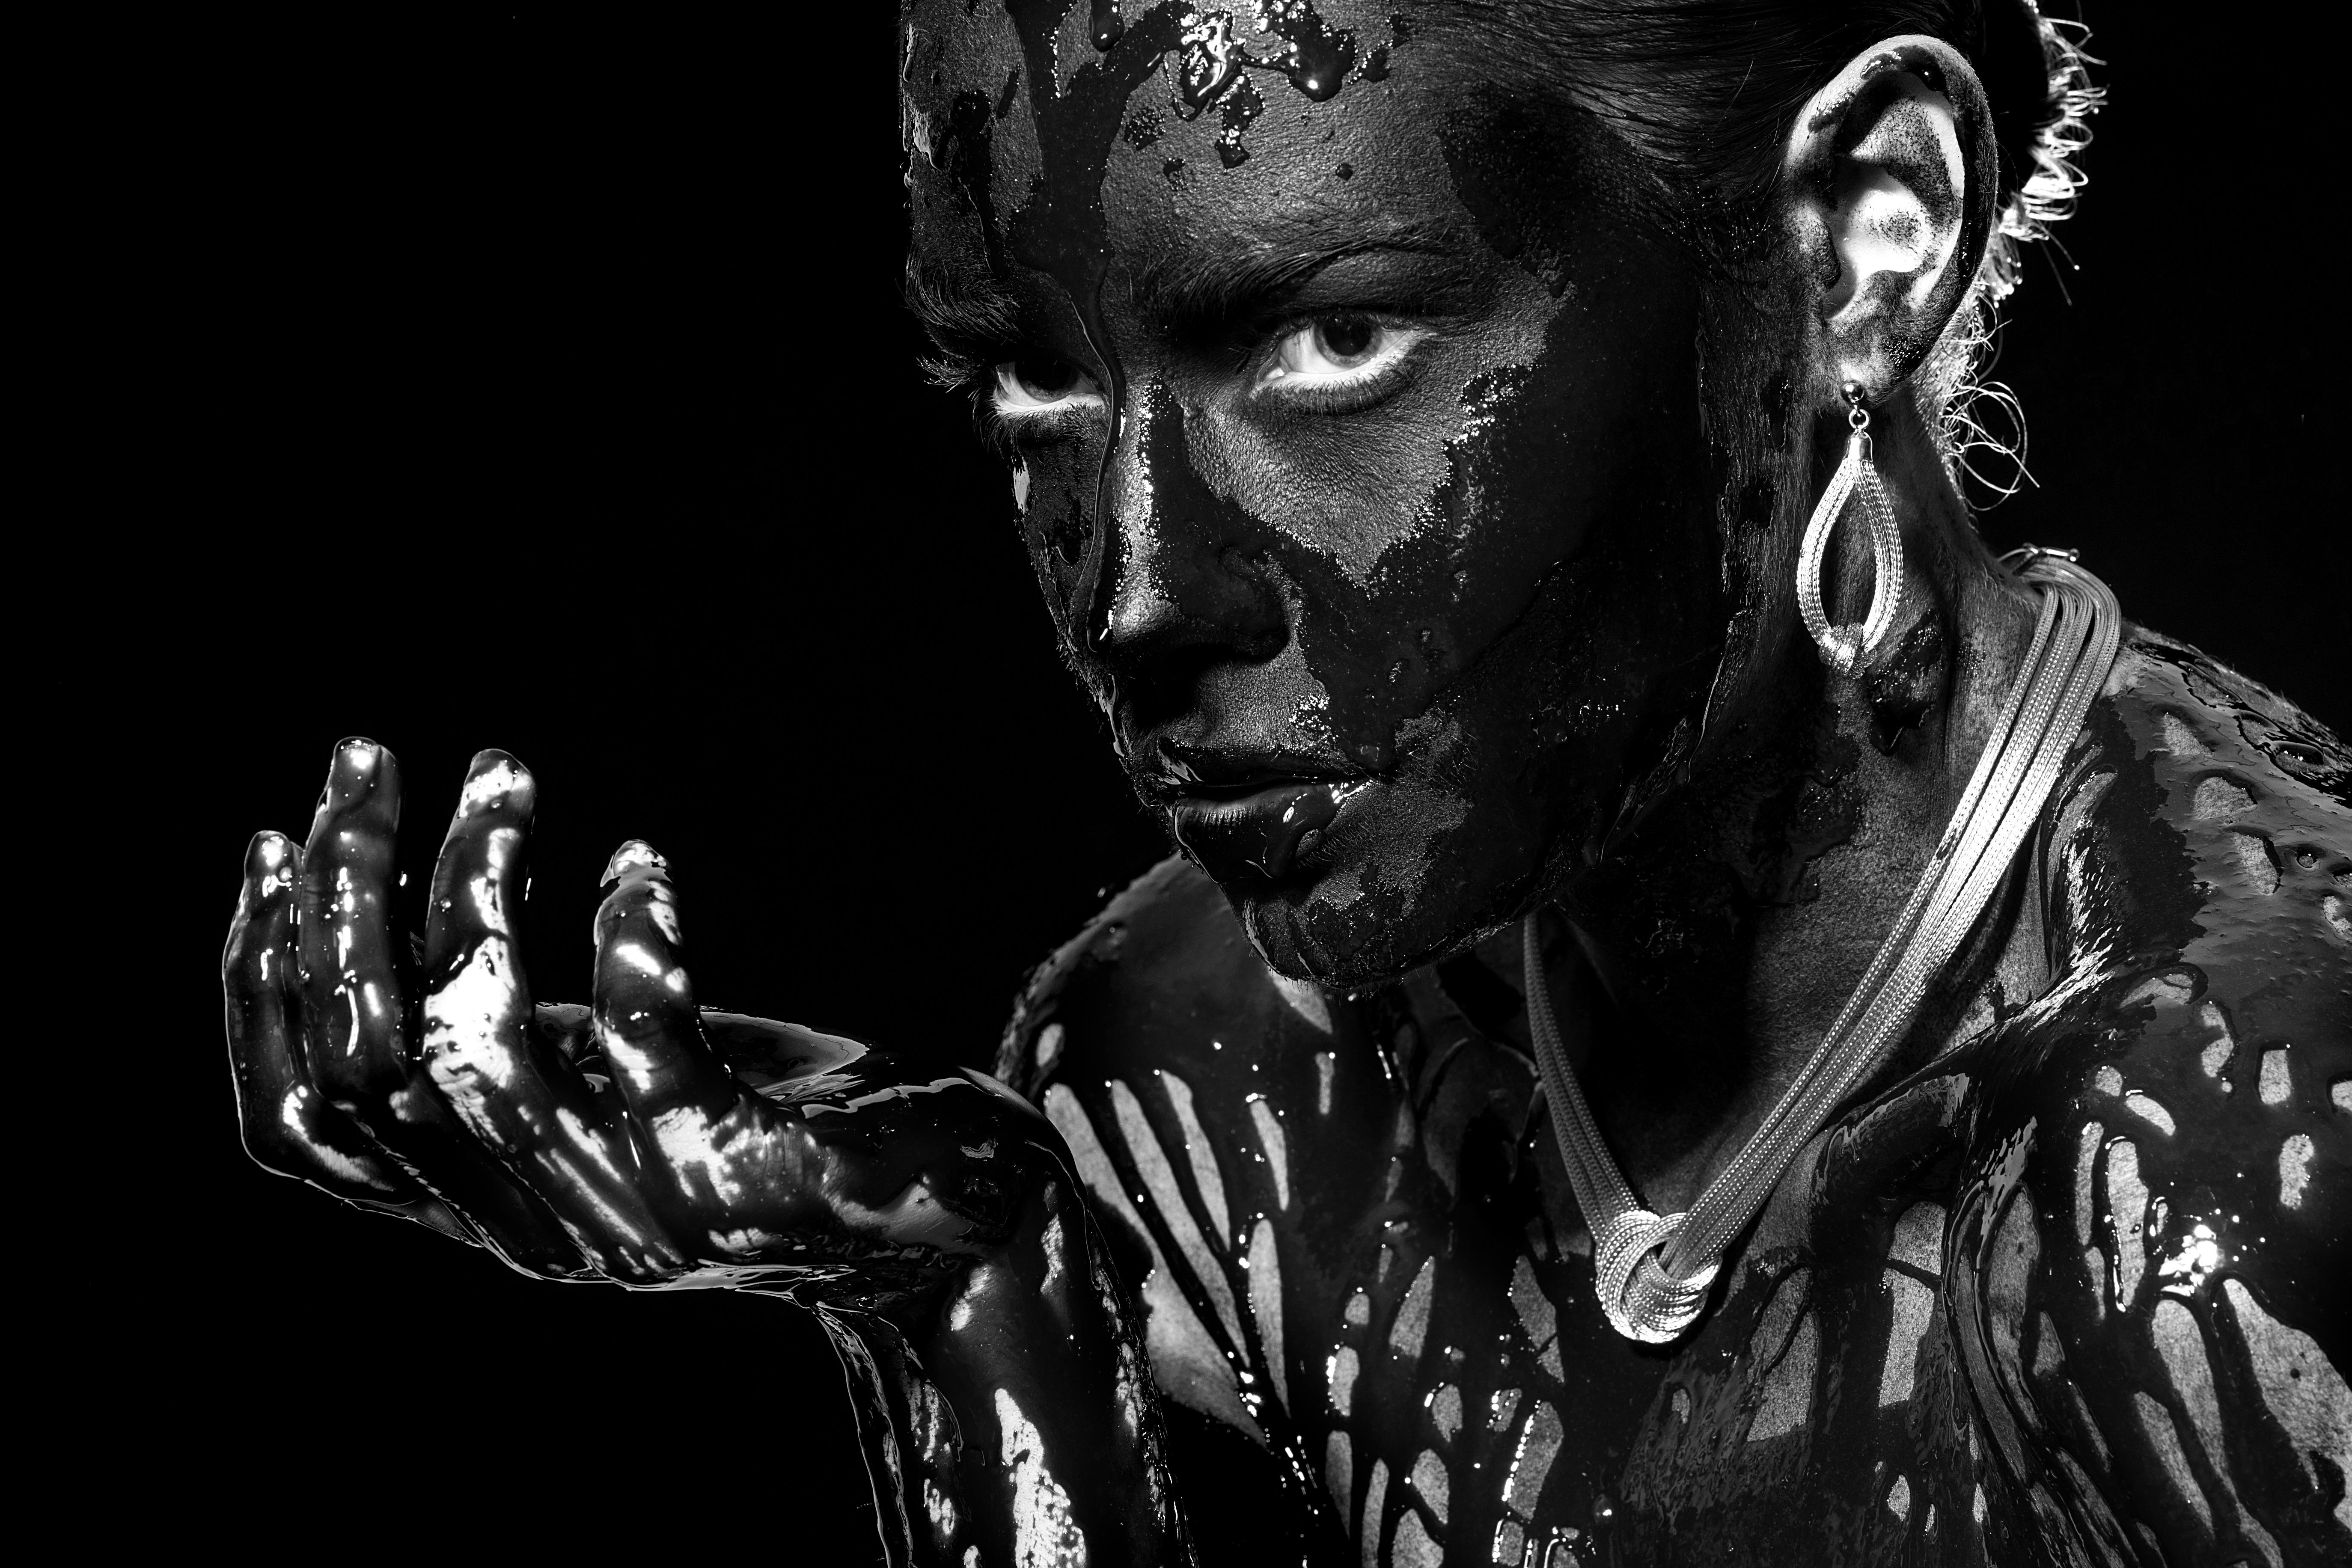 Fotoğraf Siyah Ve Beyaz Insanlar Portre Model Stüdyo Insan